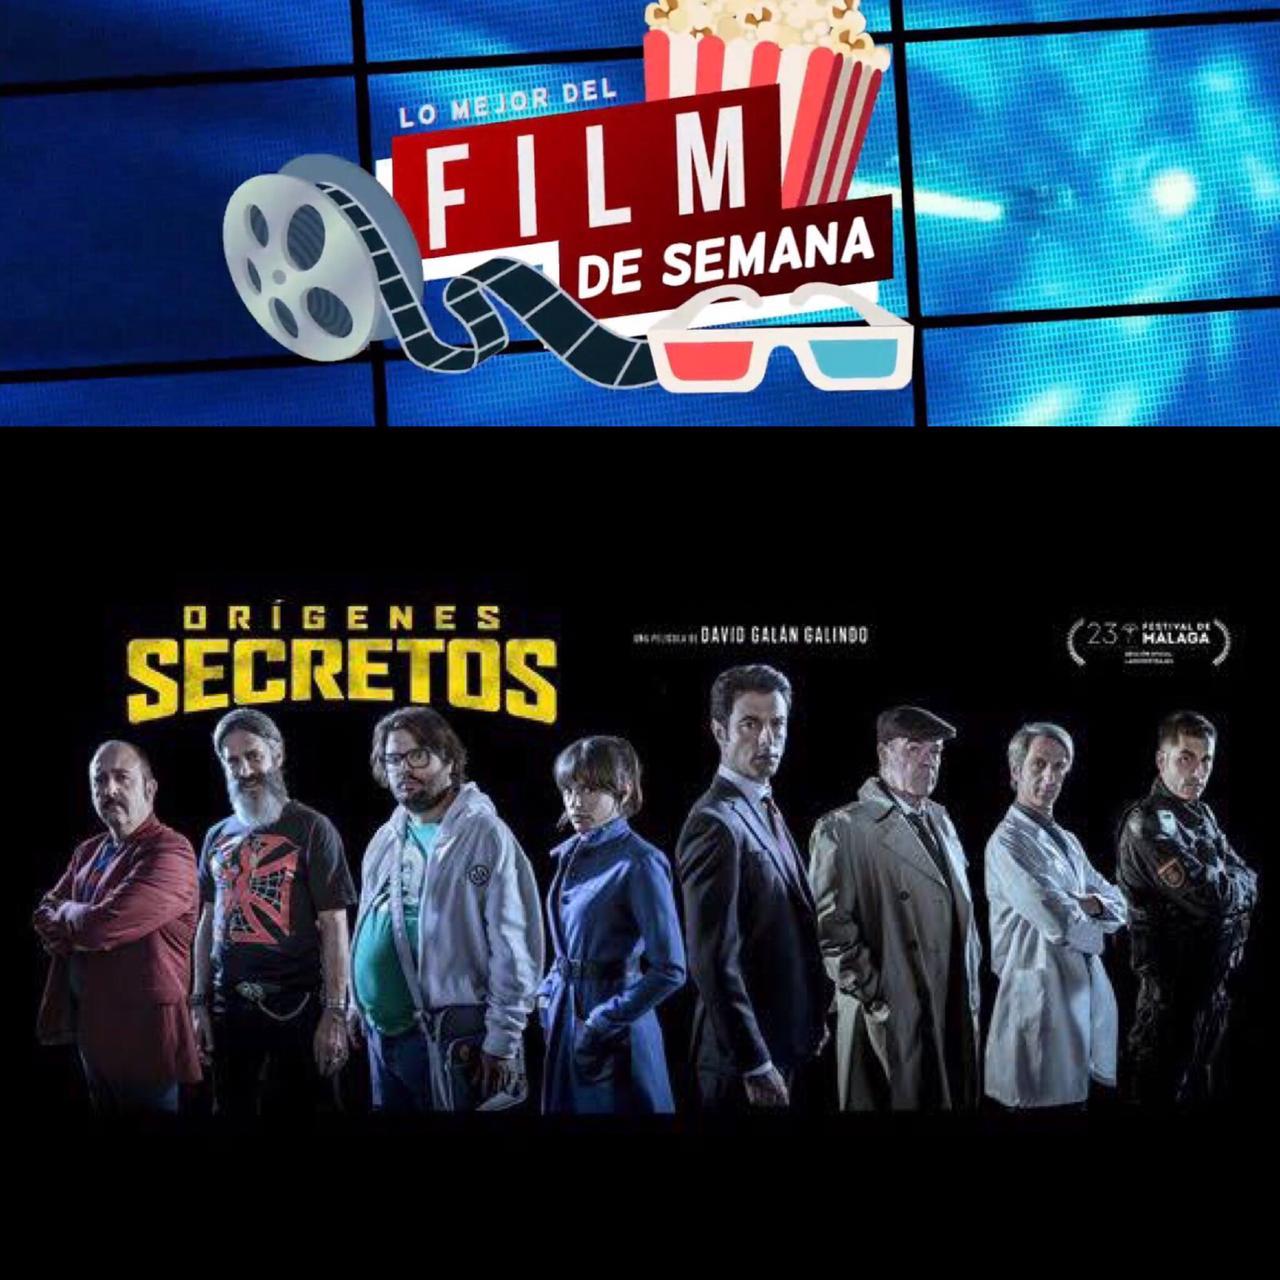 El Film de la Semana, Superhéroes a la española: